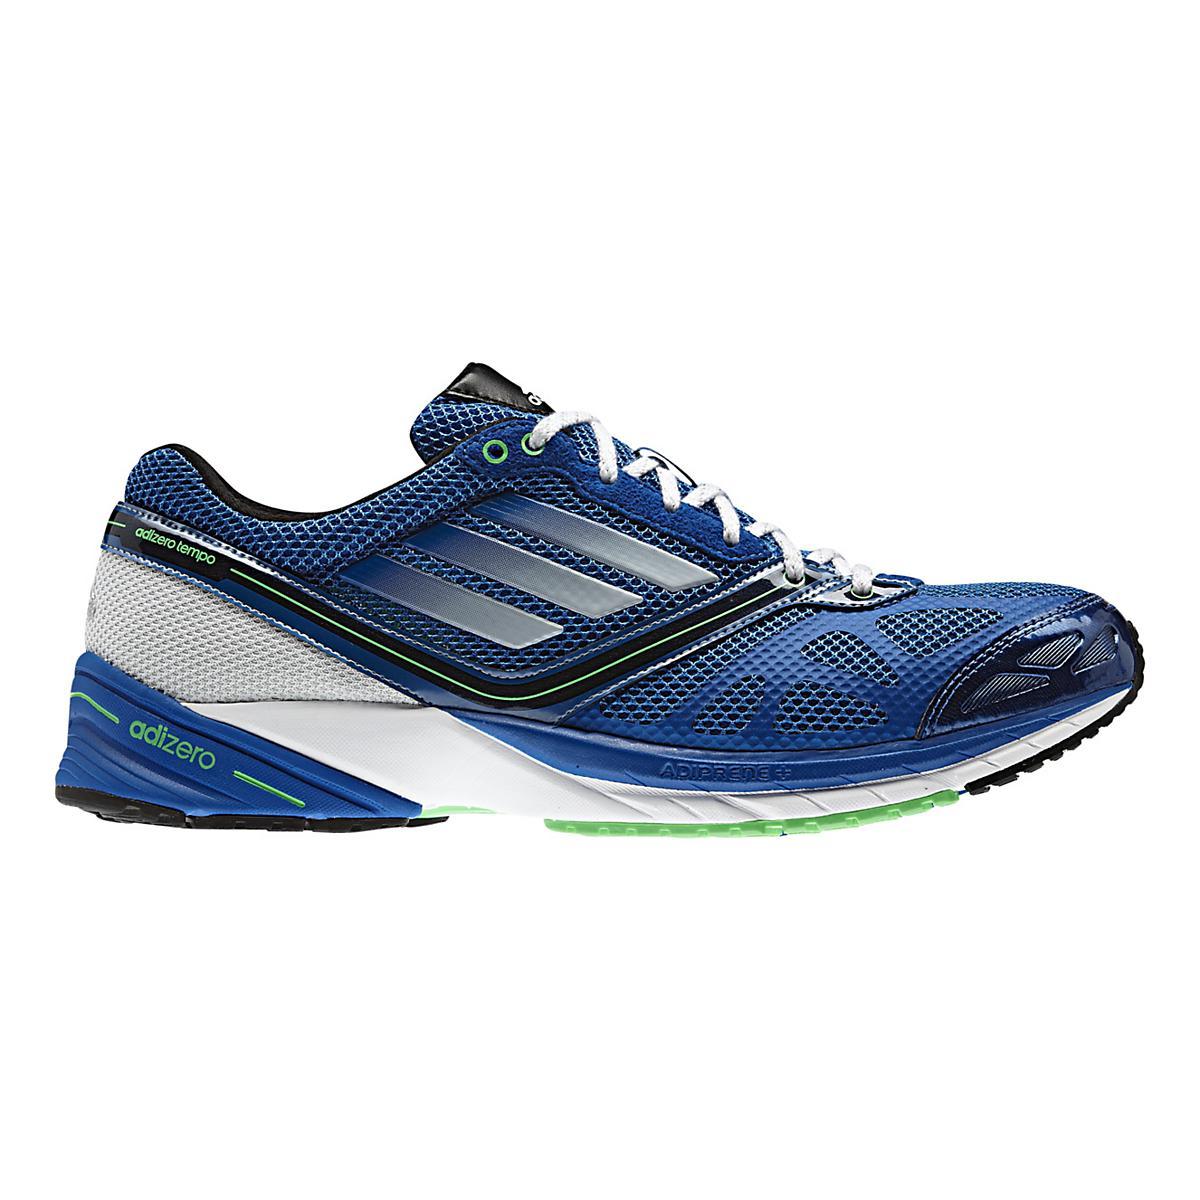 5be6312052f Mens adidas adizero Tempo 5 Running Shoe at Road Runner Sports